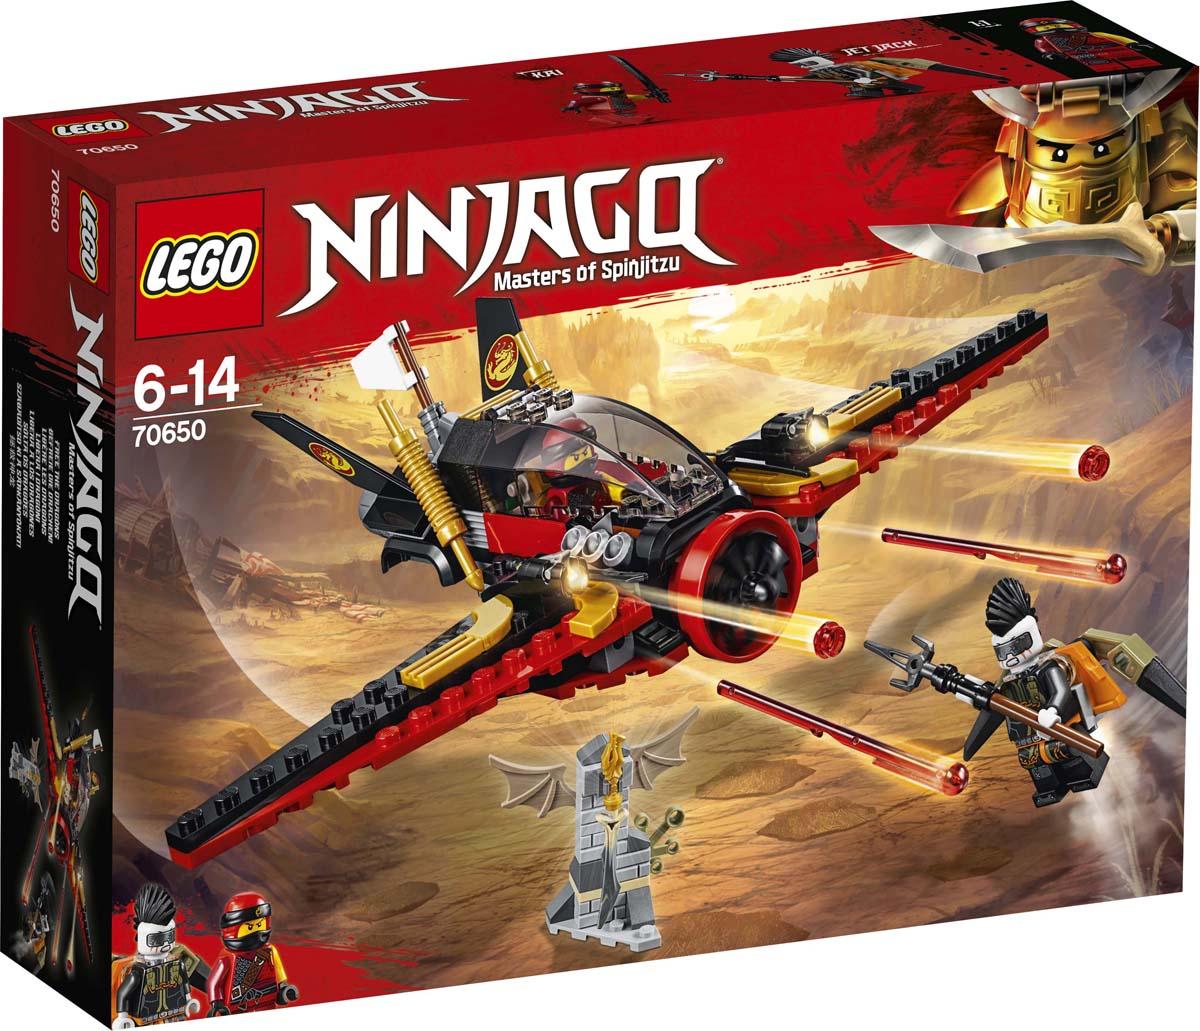 LEGO NINJAGO 70650 Крыло судьбы Конструктор lego ninjago битва гармадона и мастера ву 70608